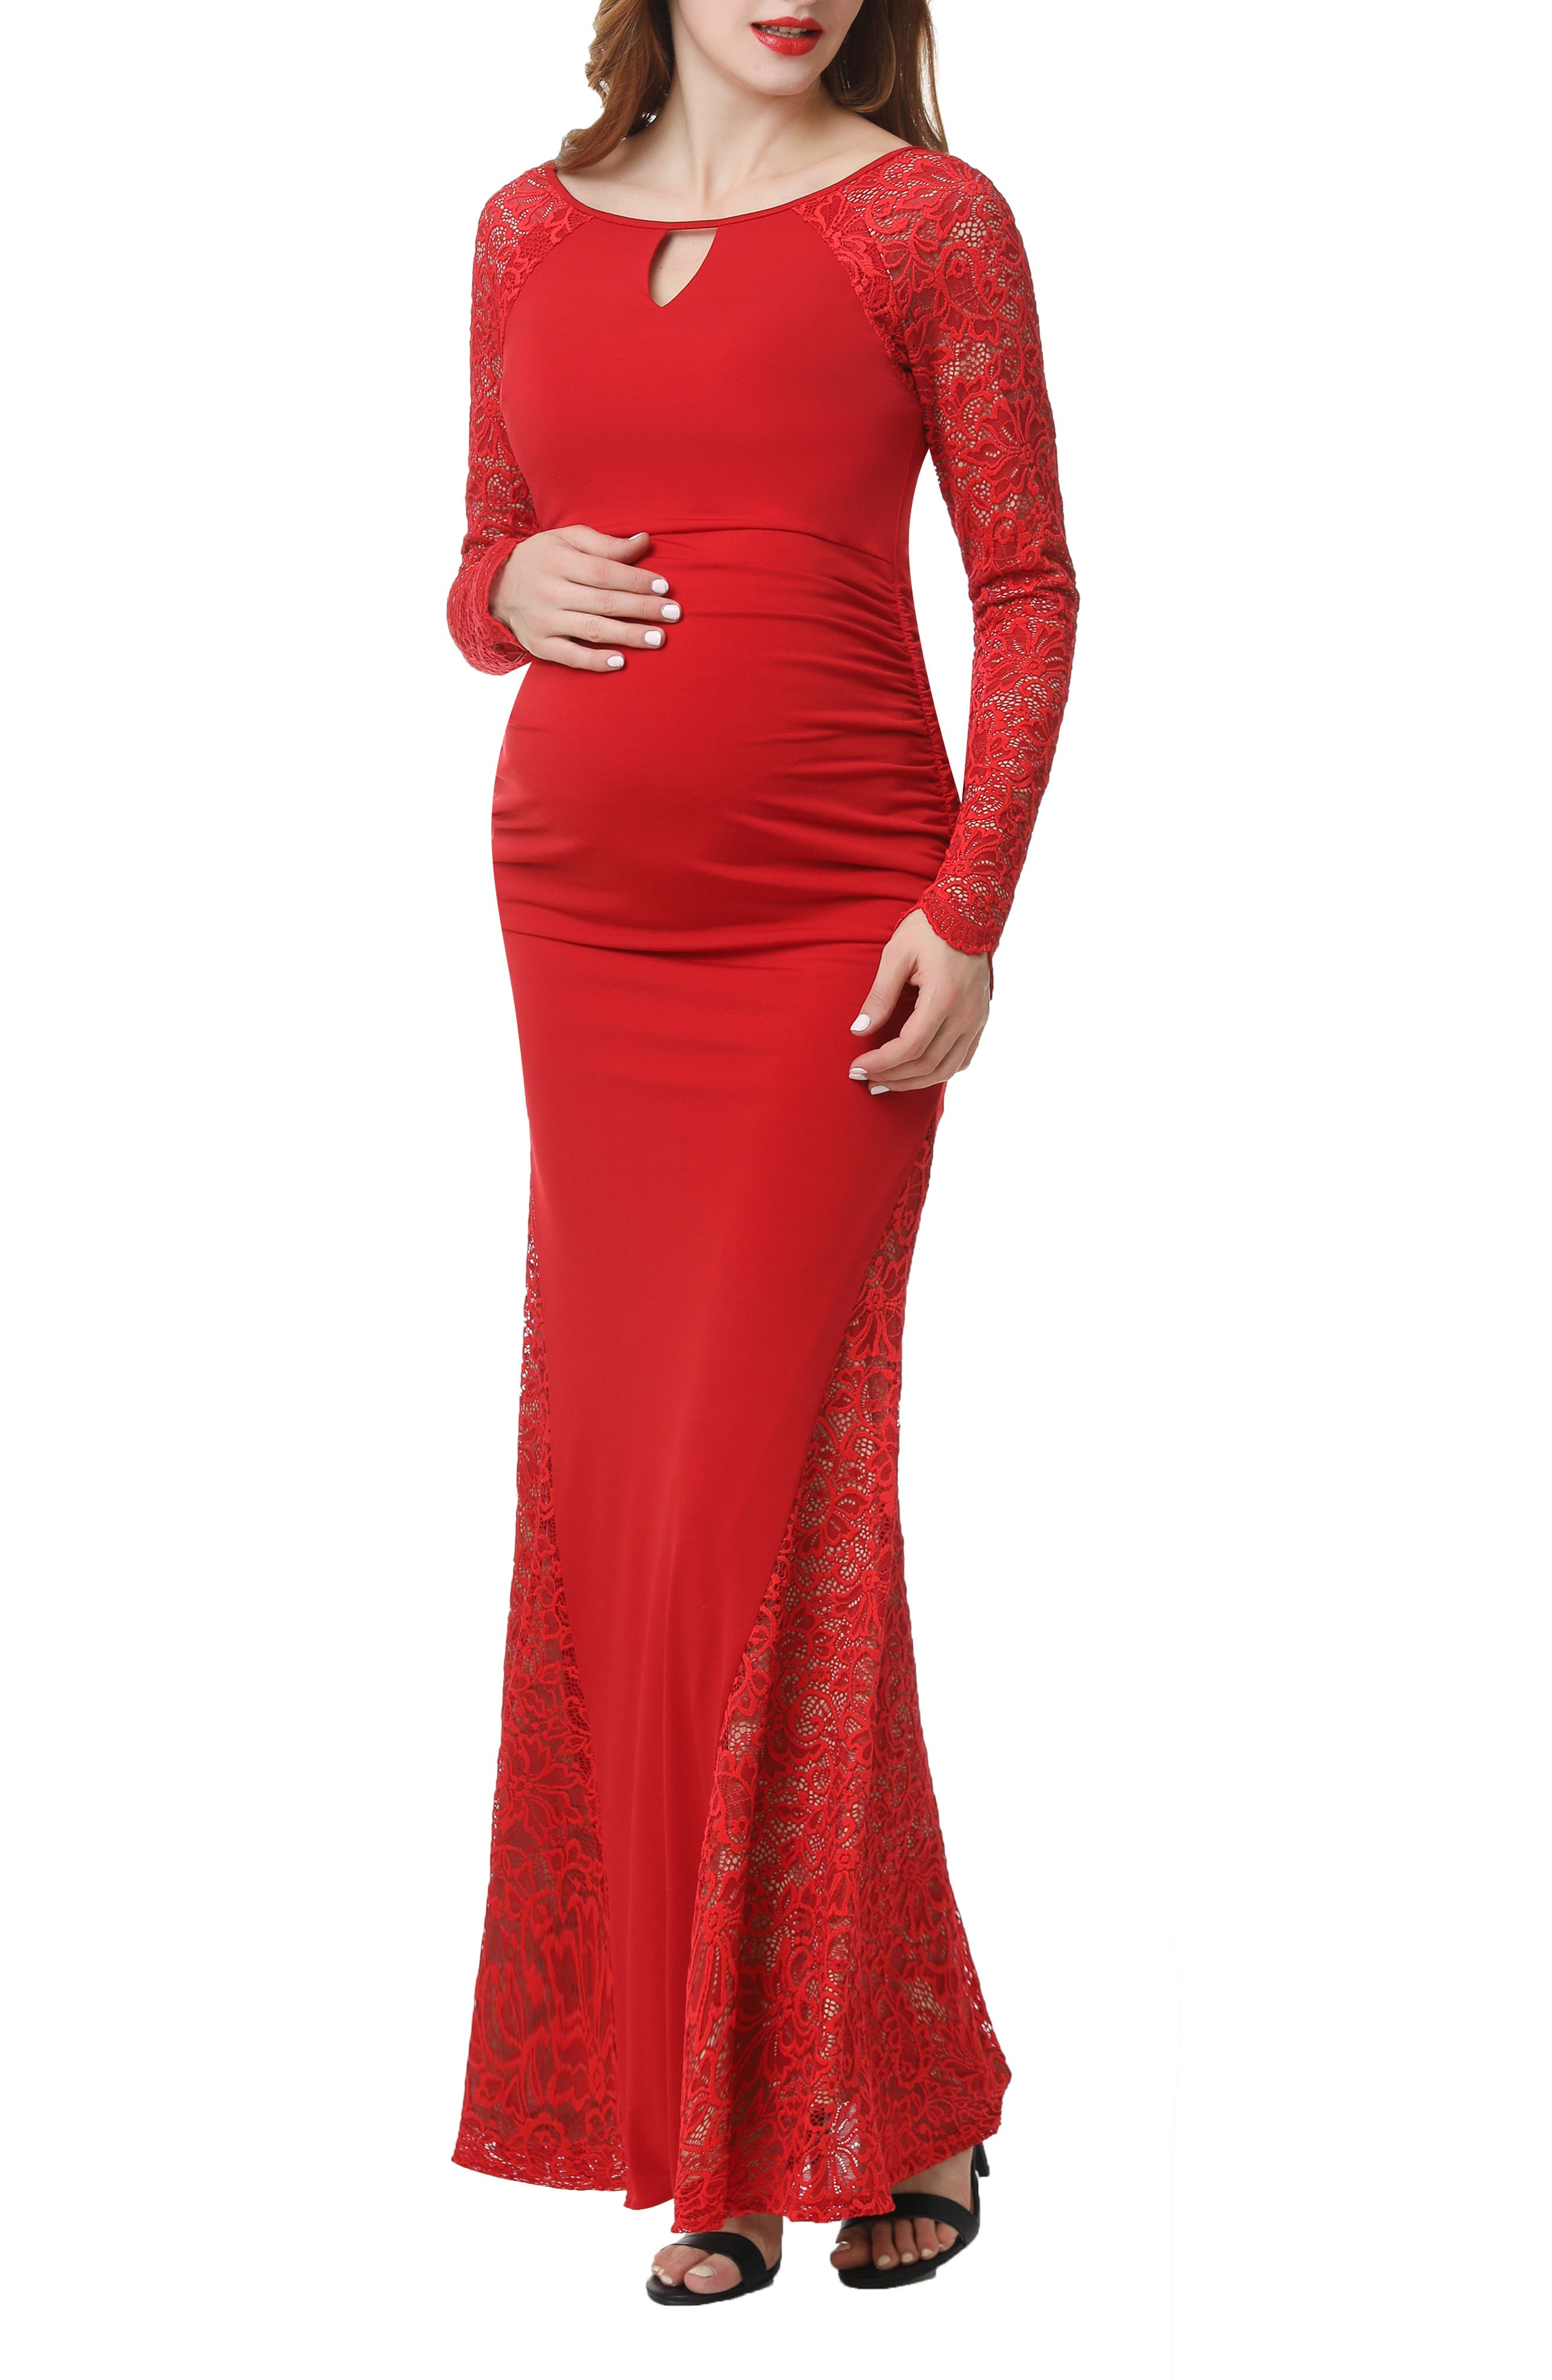 Kimi And Kai Bella Maternity Maxi Dress, Red